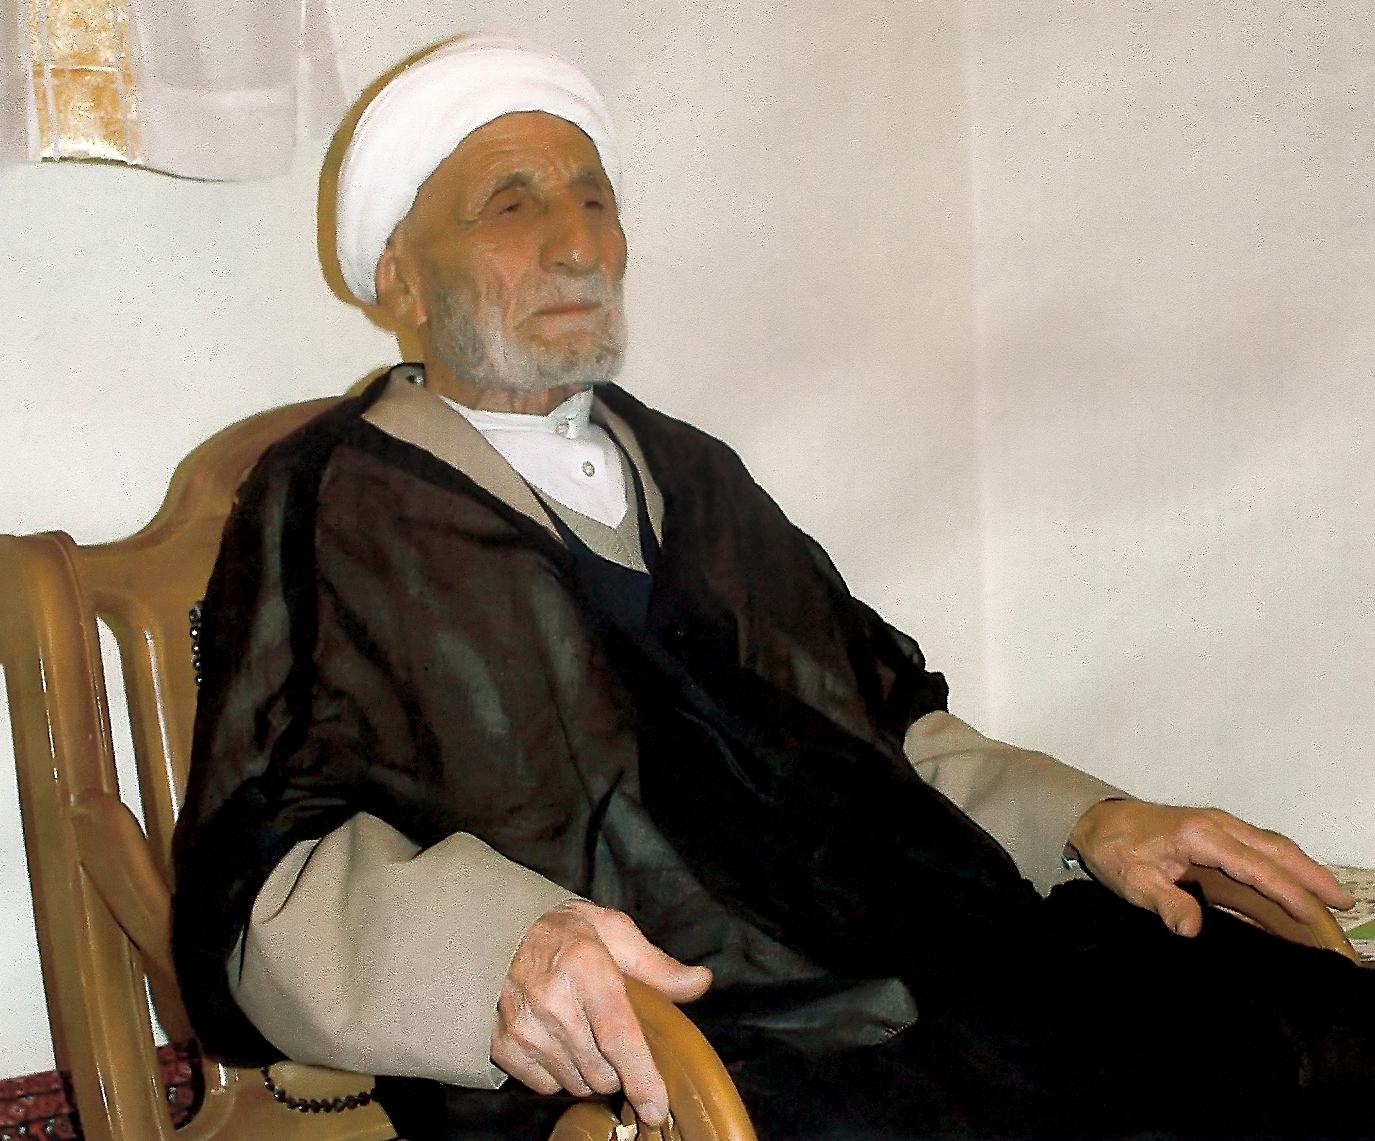 حجت الاسلام والمسلمین حاج شیخ فتح الله تاجیک اسماعیلی